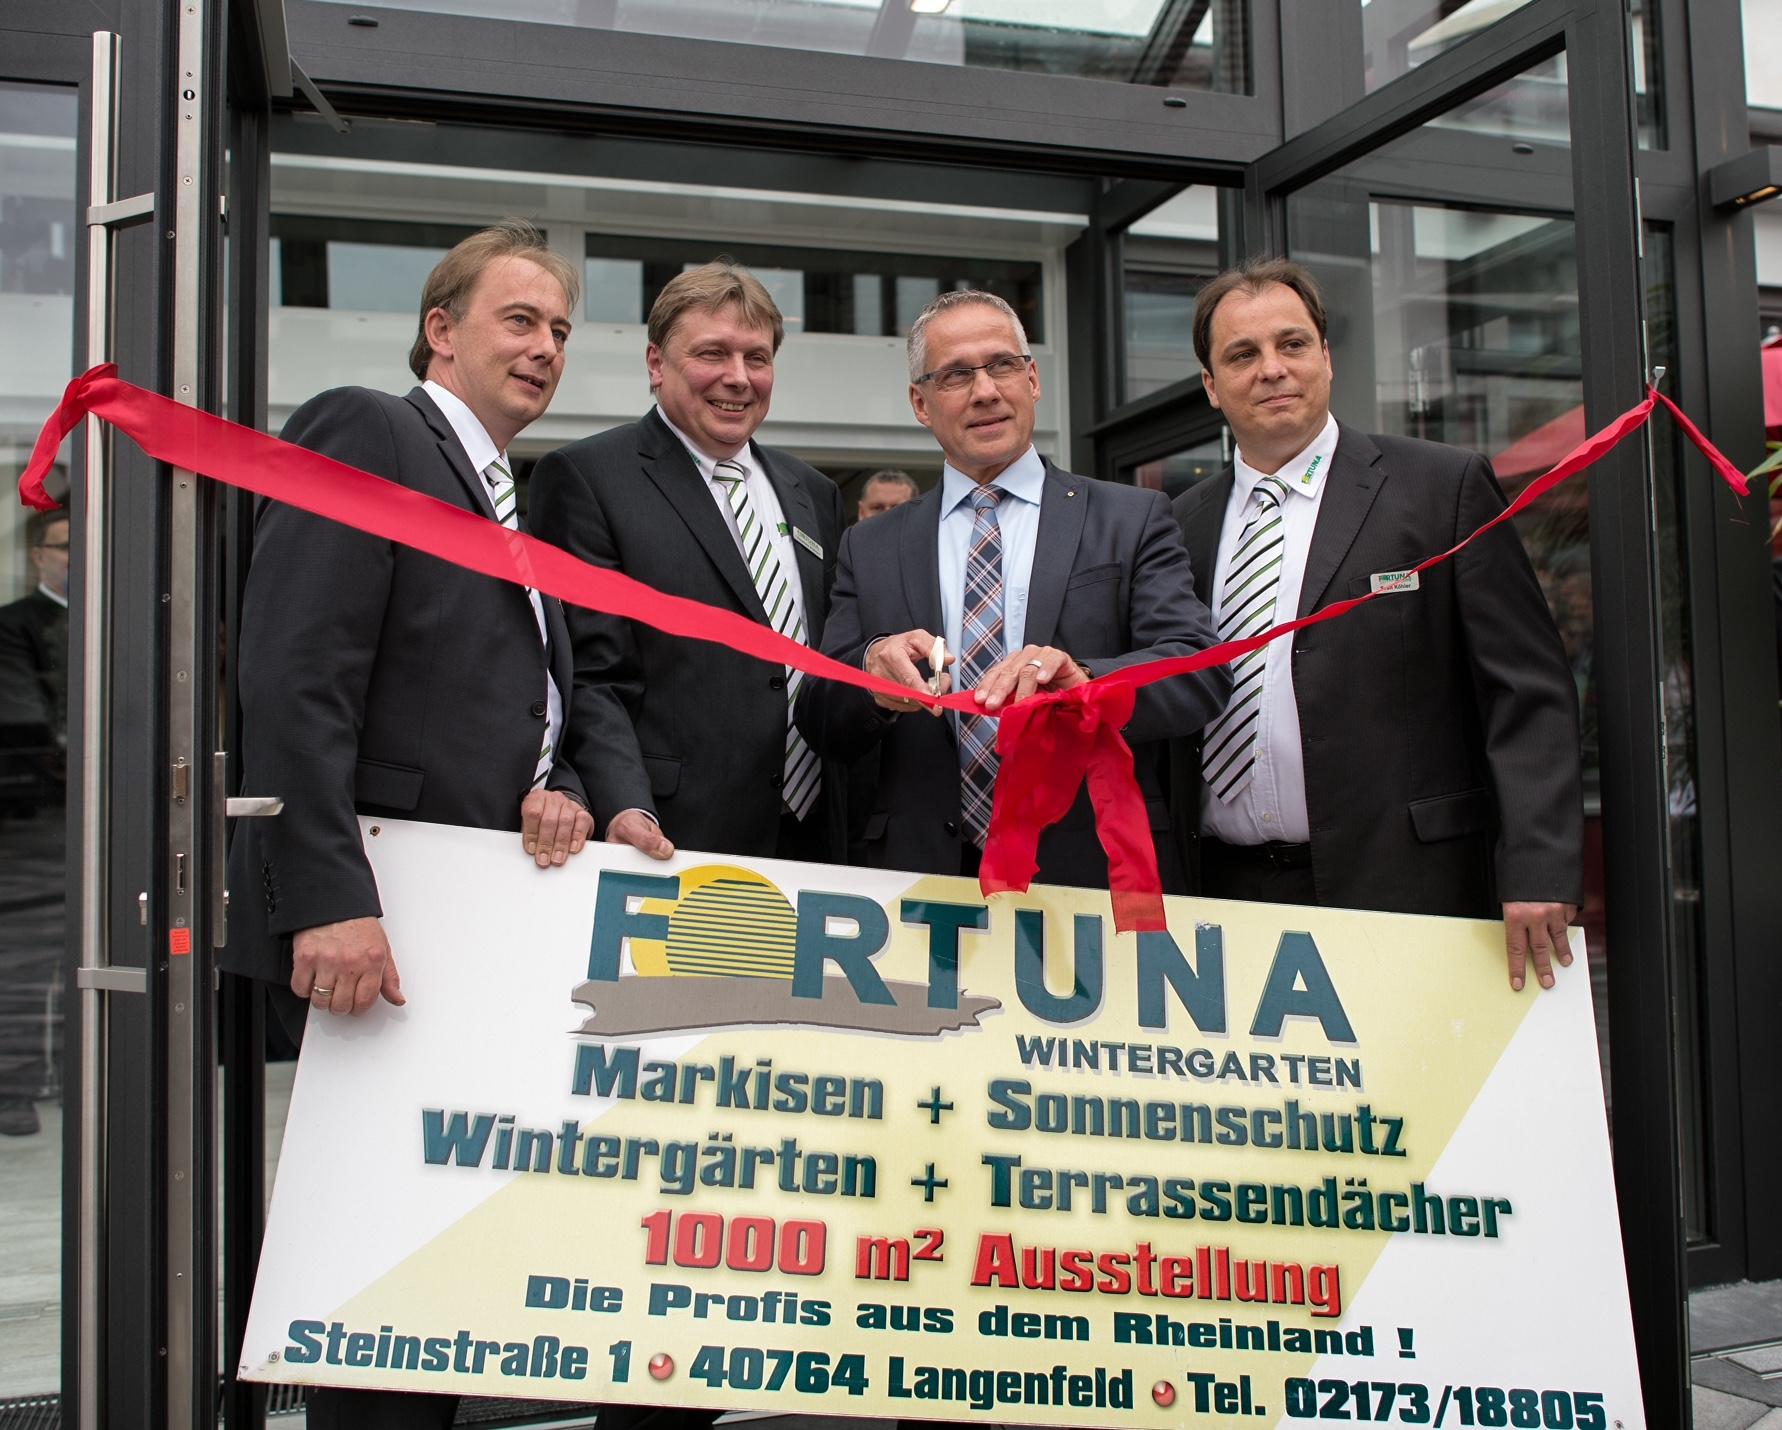 Fortuna Wintergarten philosophie fortuna wintgergarten